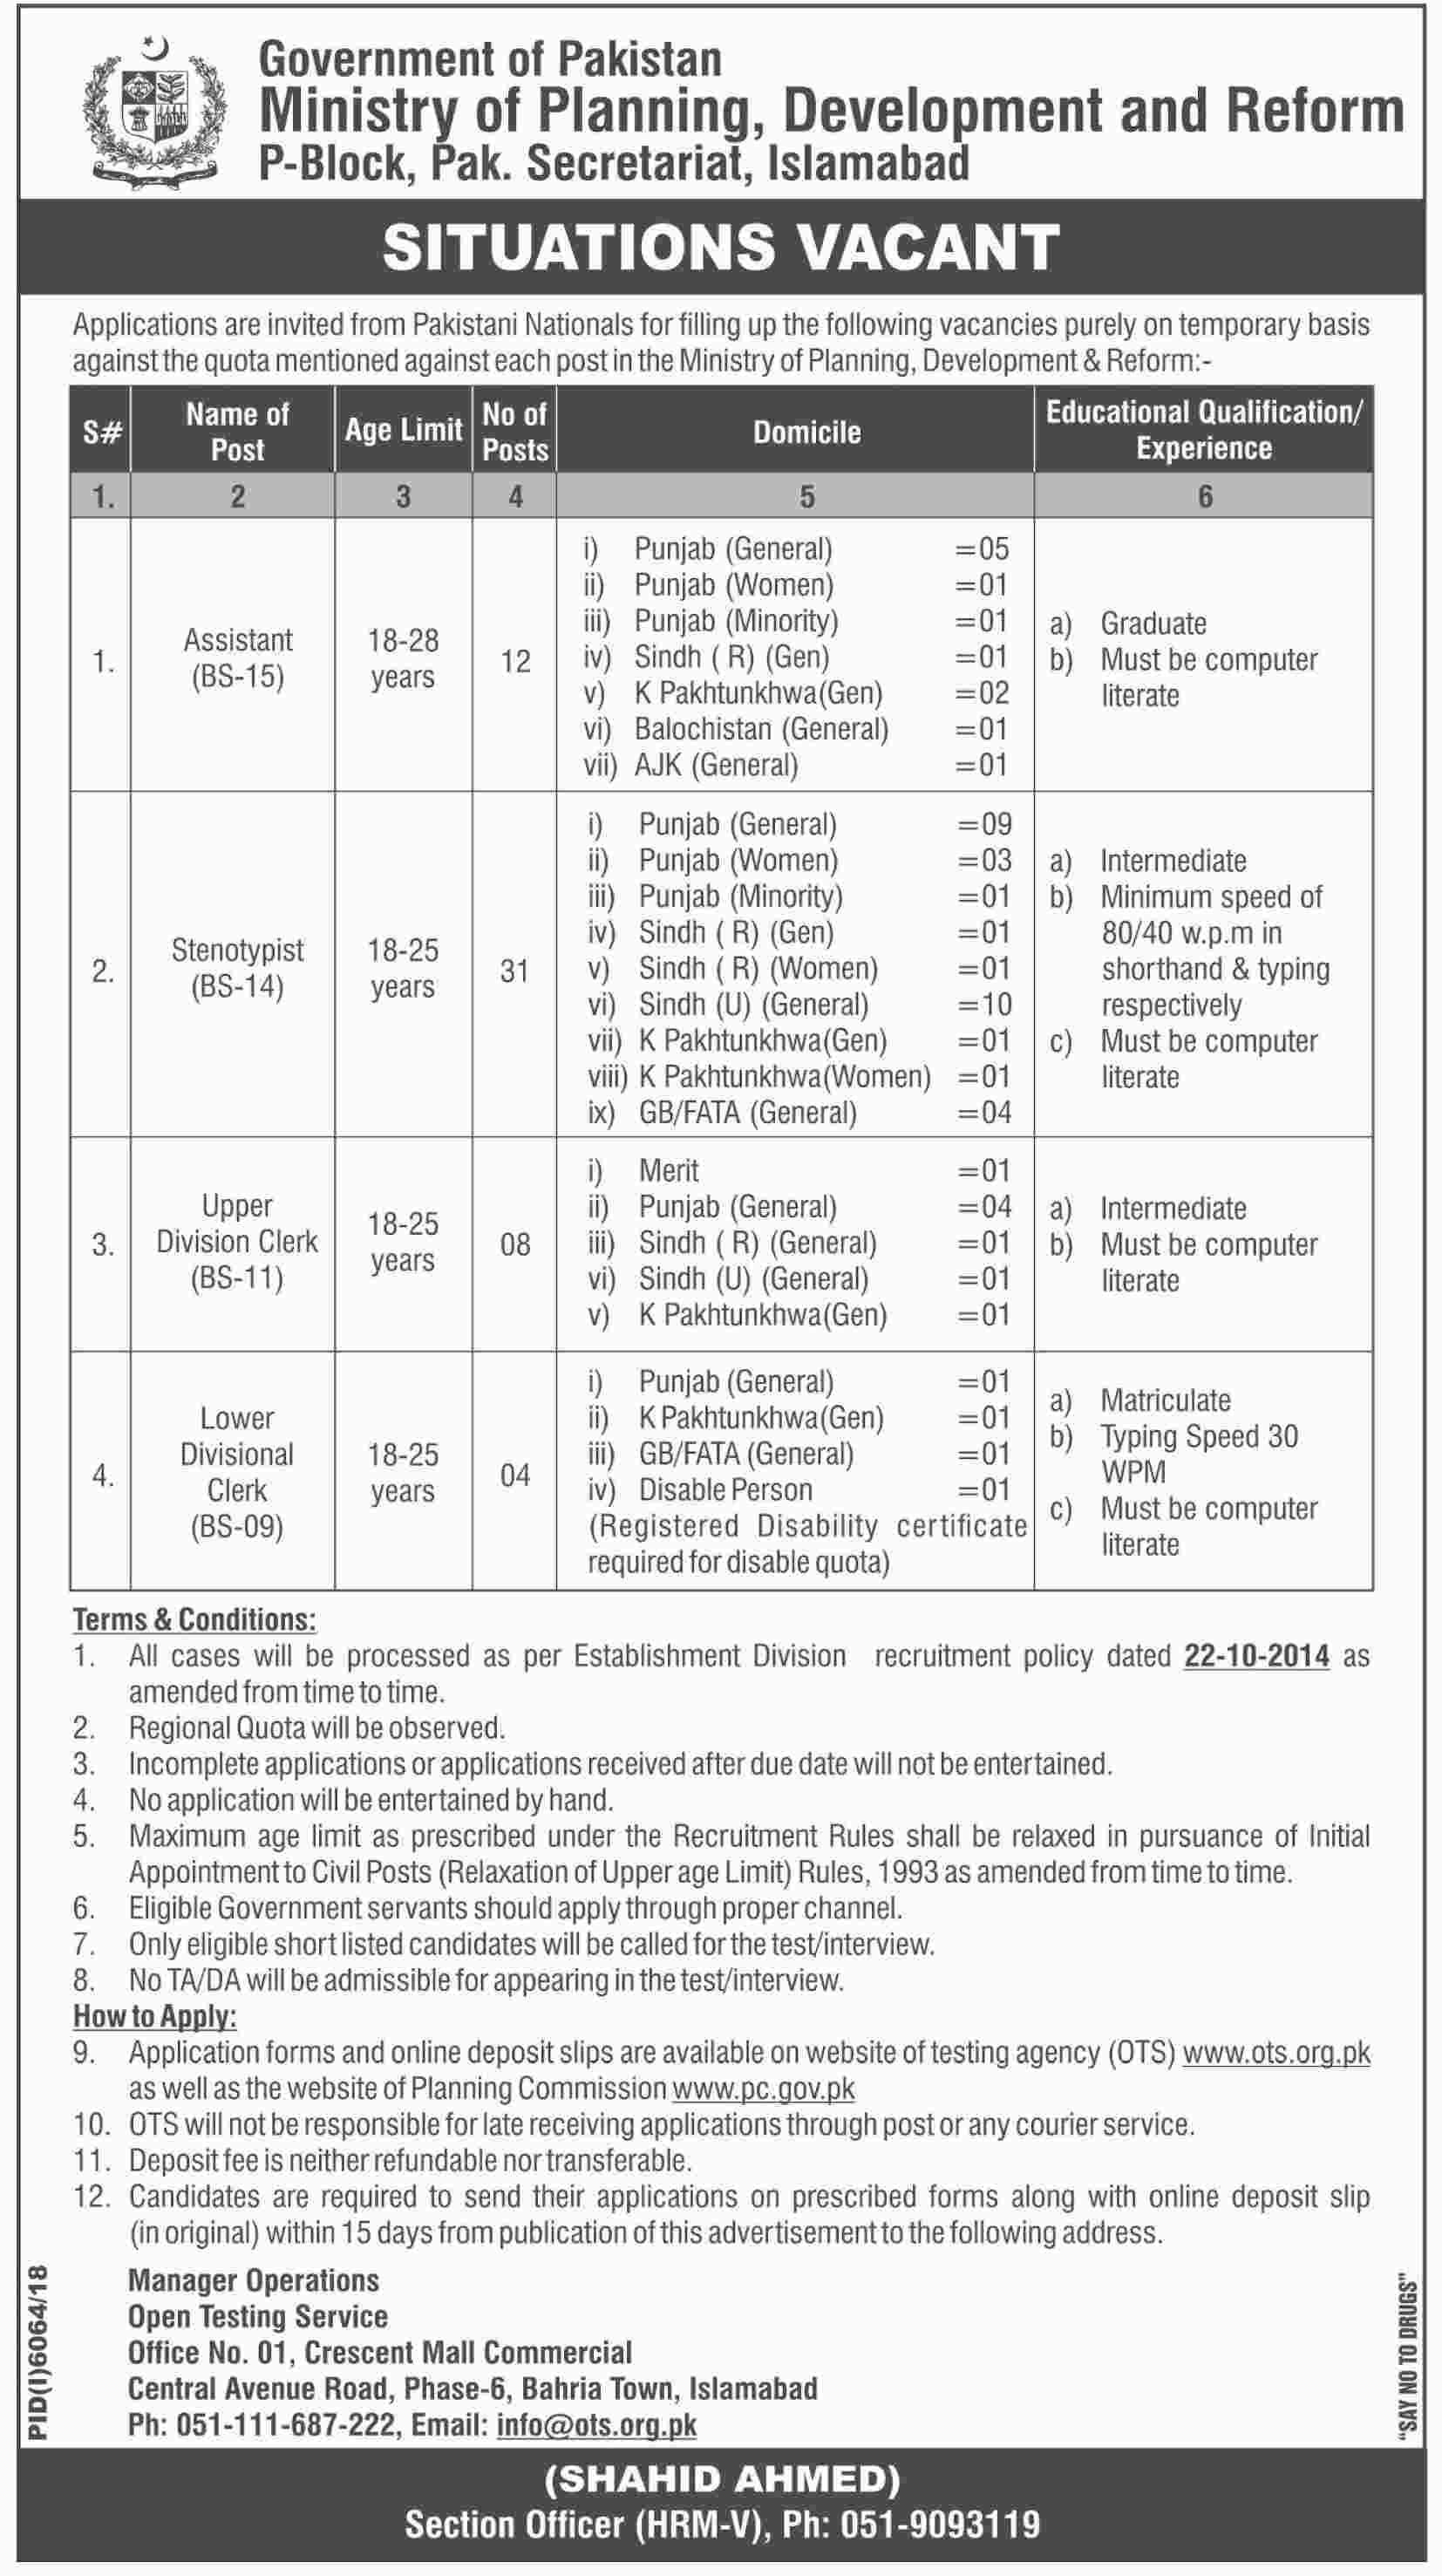 Ministry of Planning Development & Reform Jobs 2019